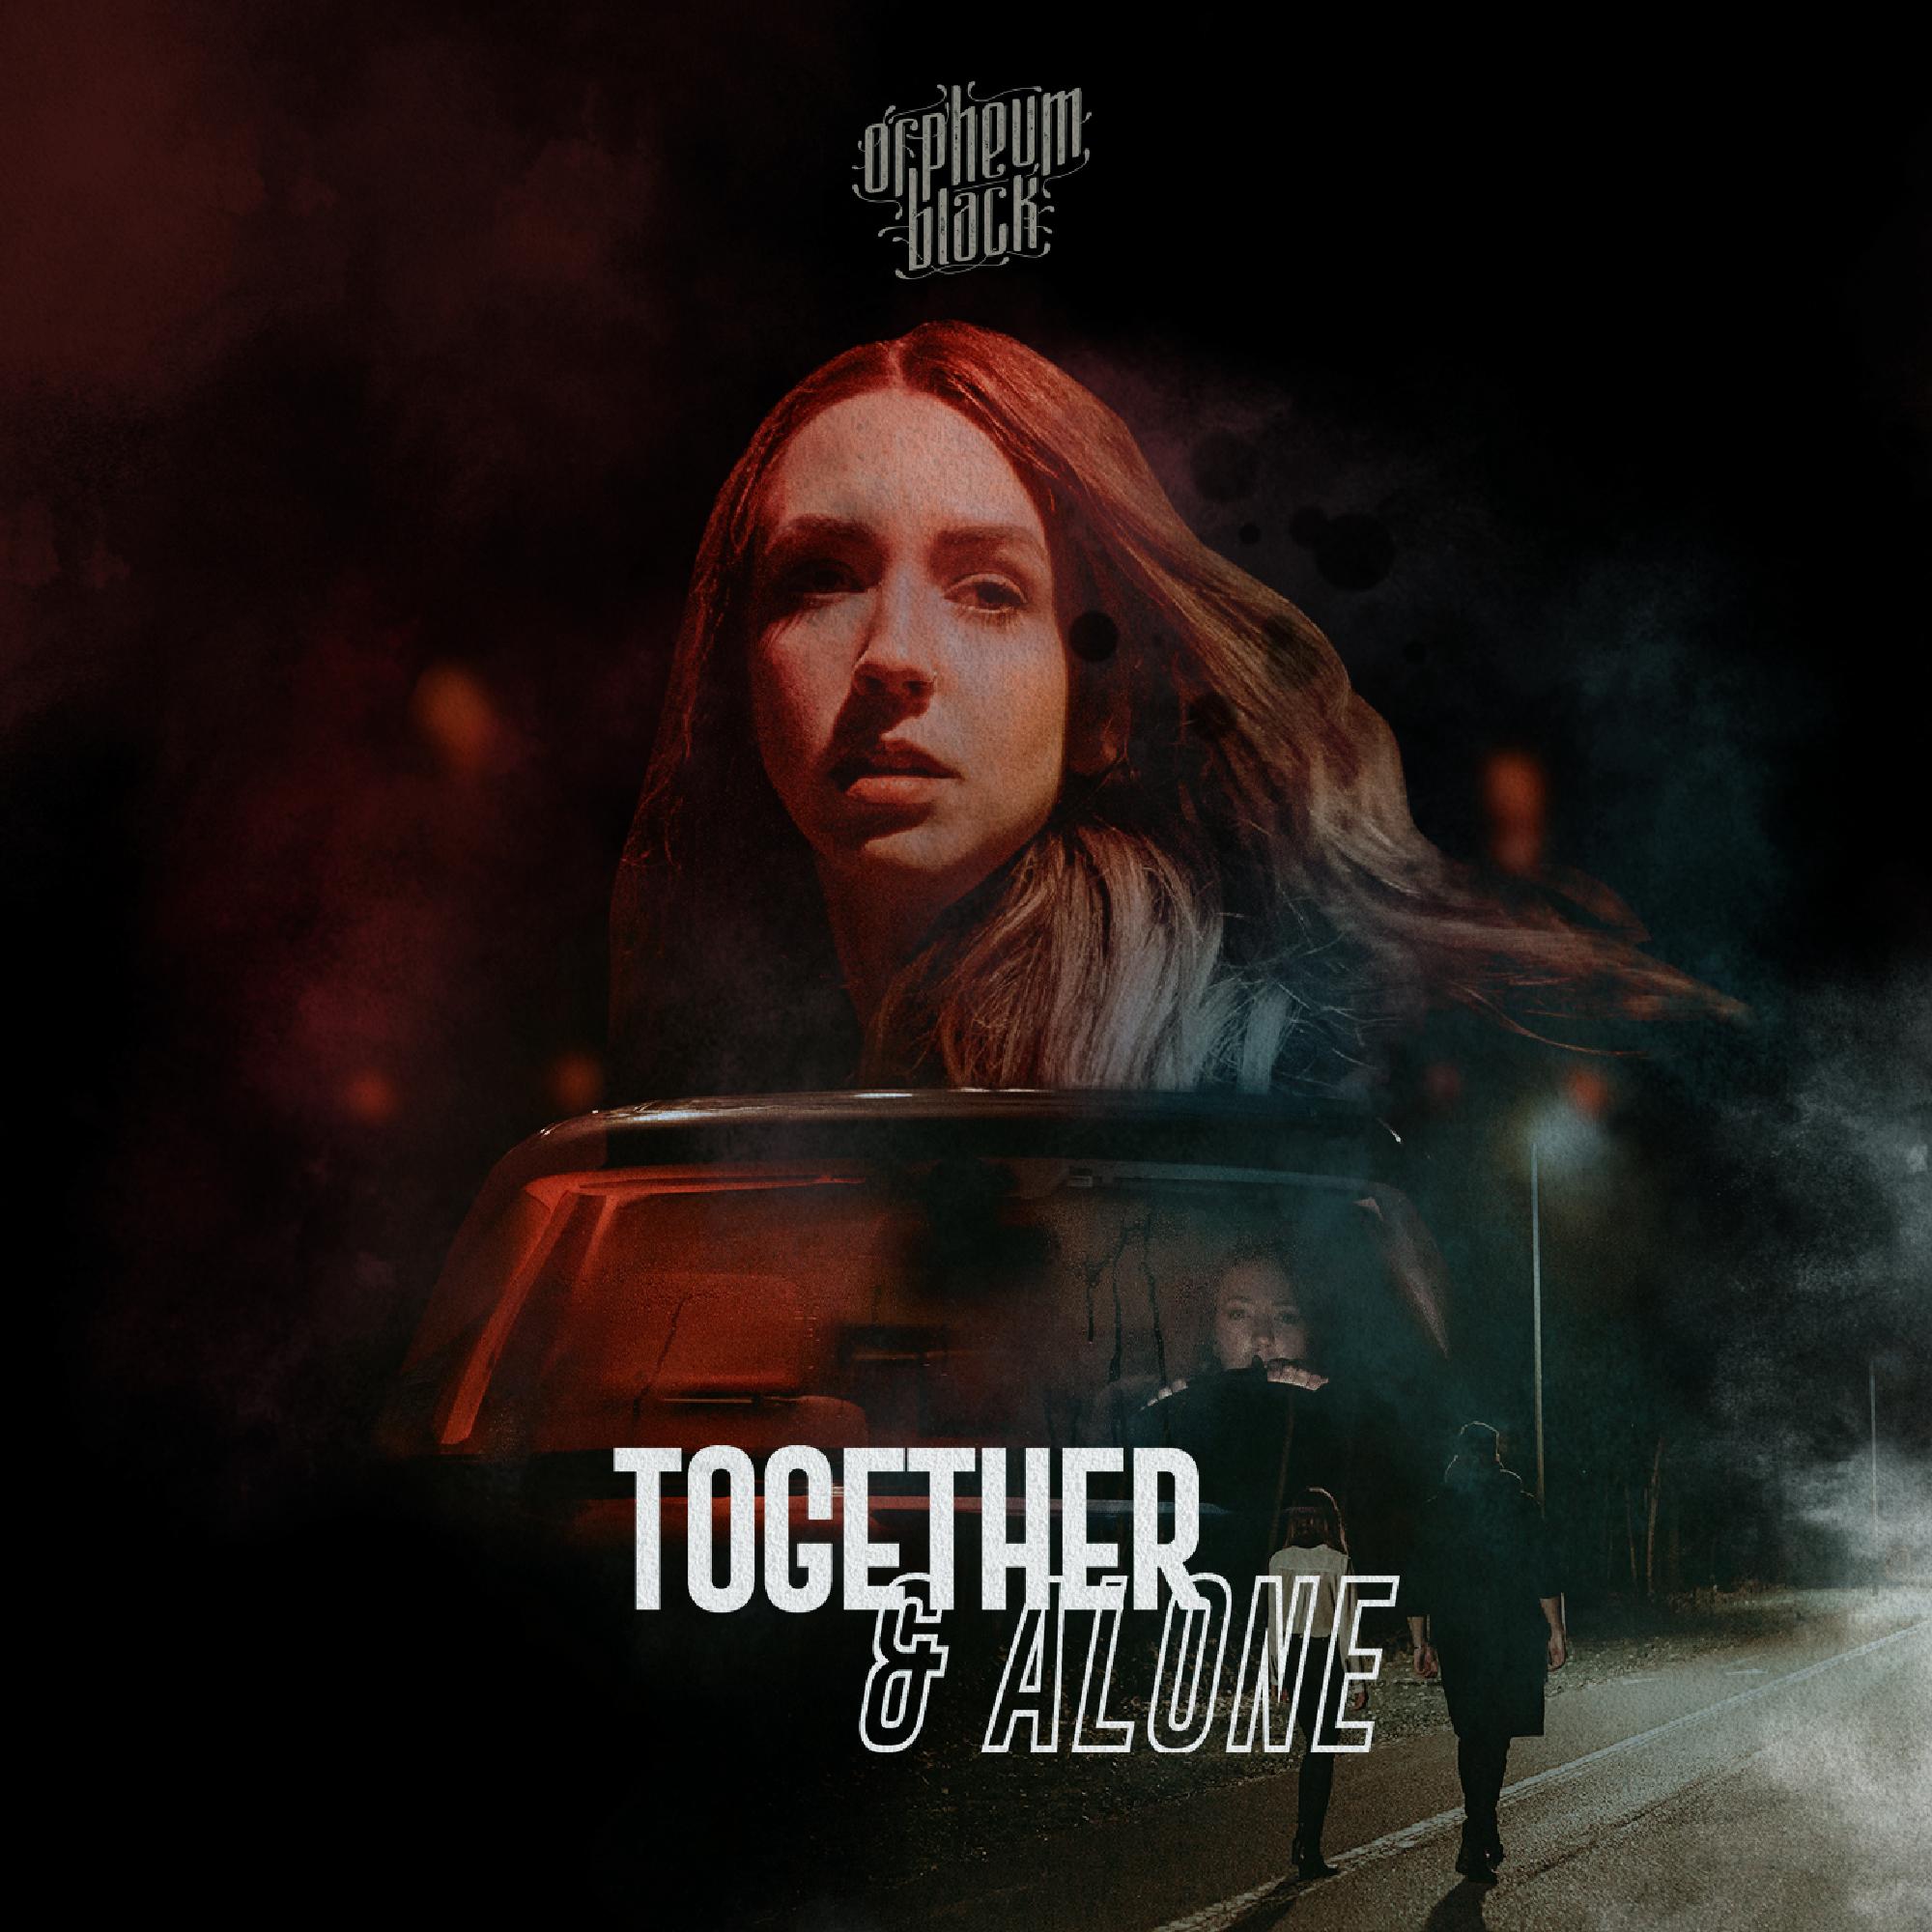 orpheum black together & alone